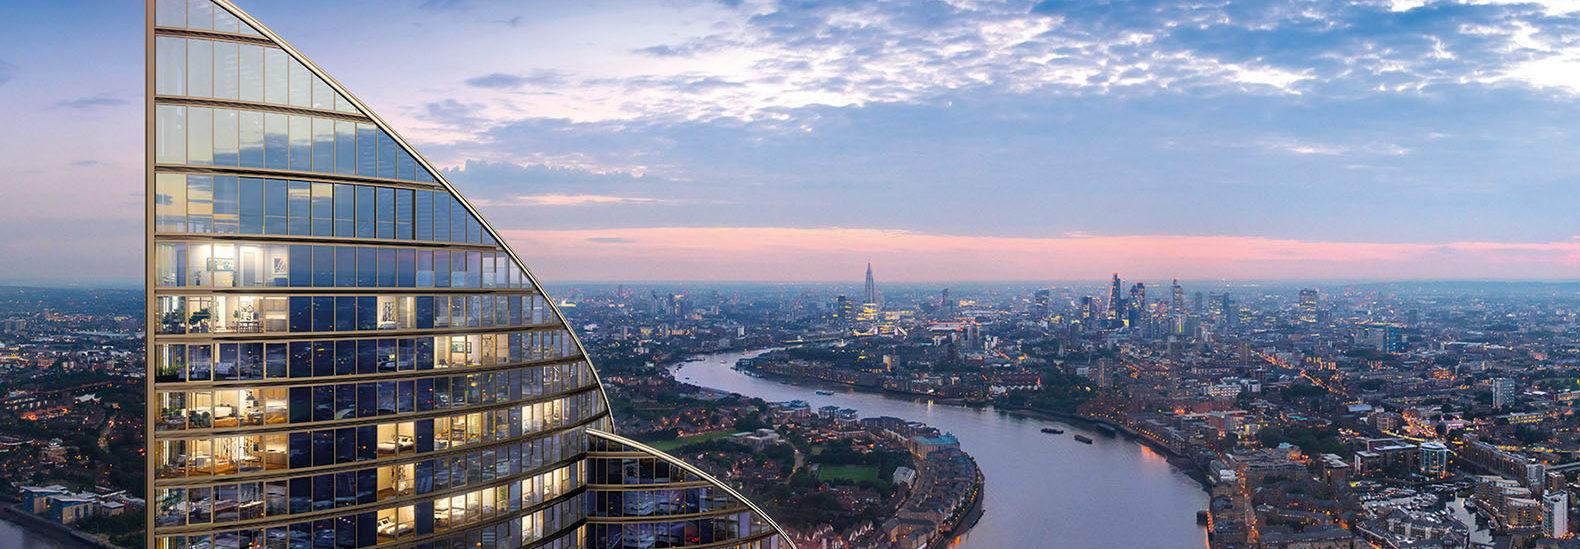 Europes Tallest Residential Tower Breaks Ground In London